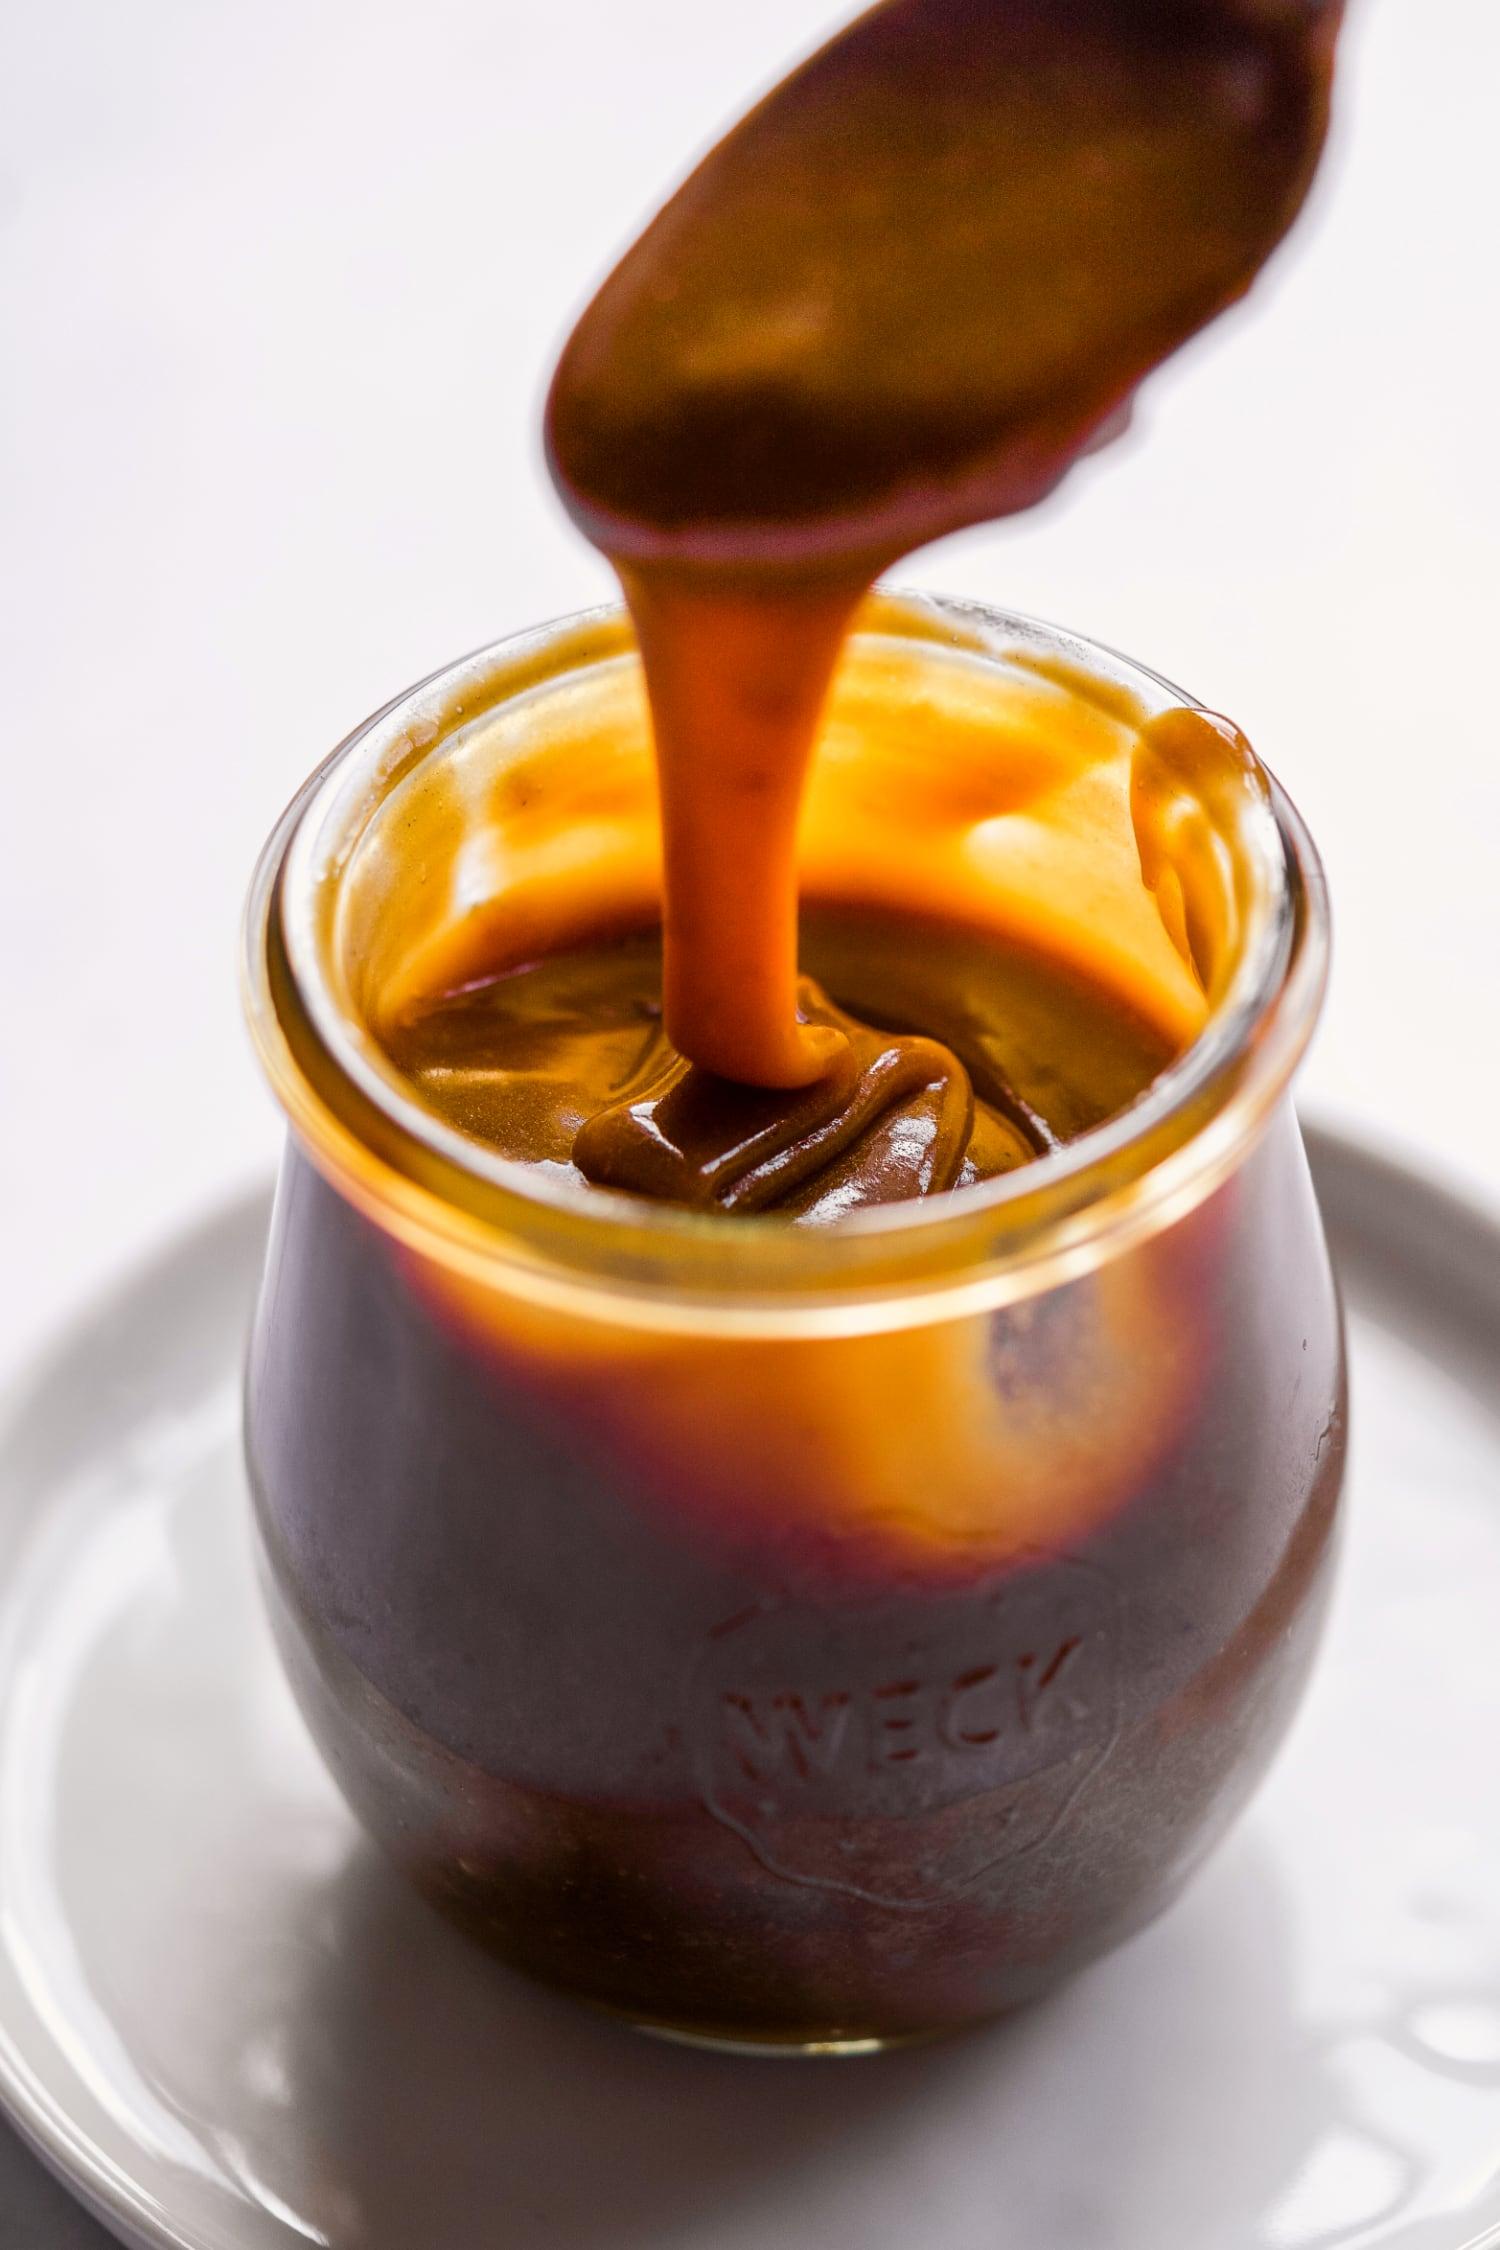 vegan caramel sauce in a jar